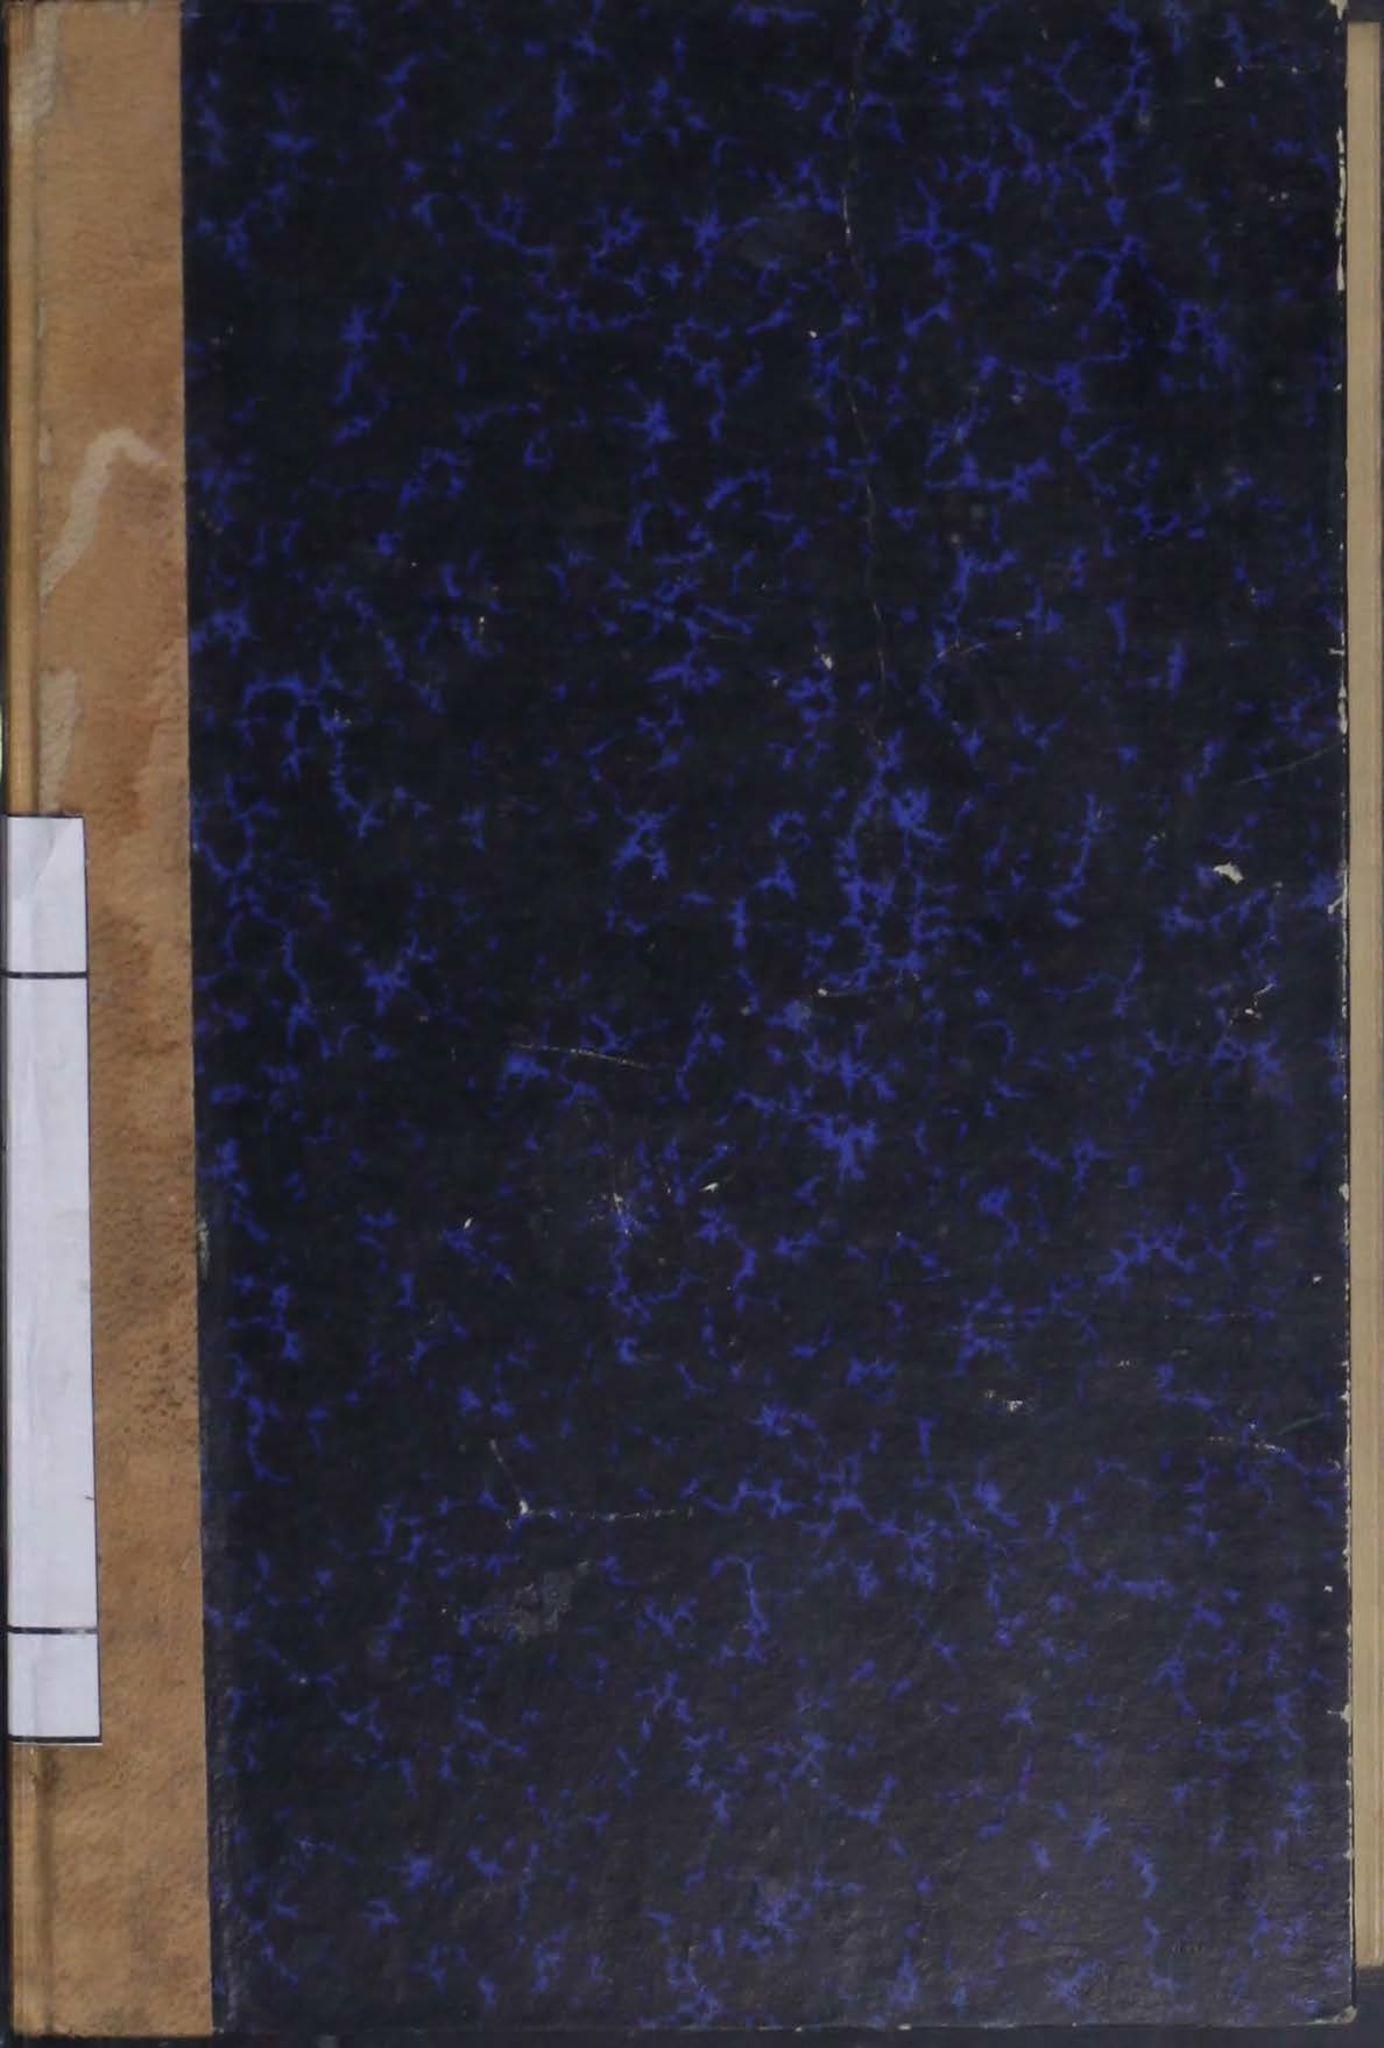 AIN, Narvik kommune. Formannskap , A/Ab/L0009: Møtebok, 1919